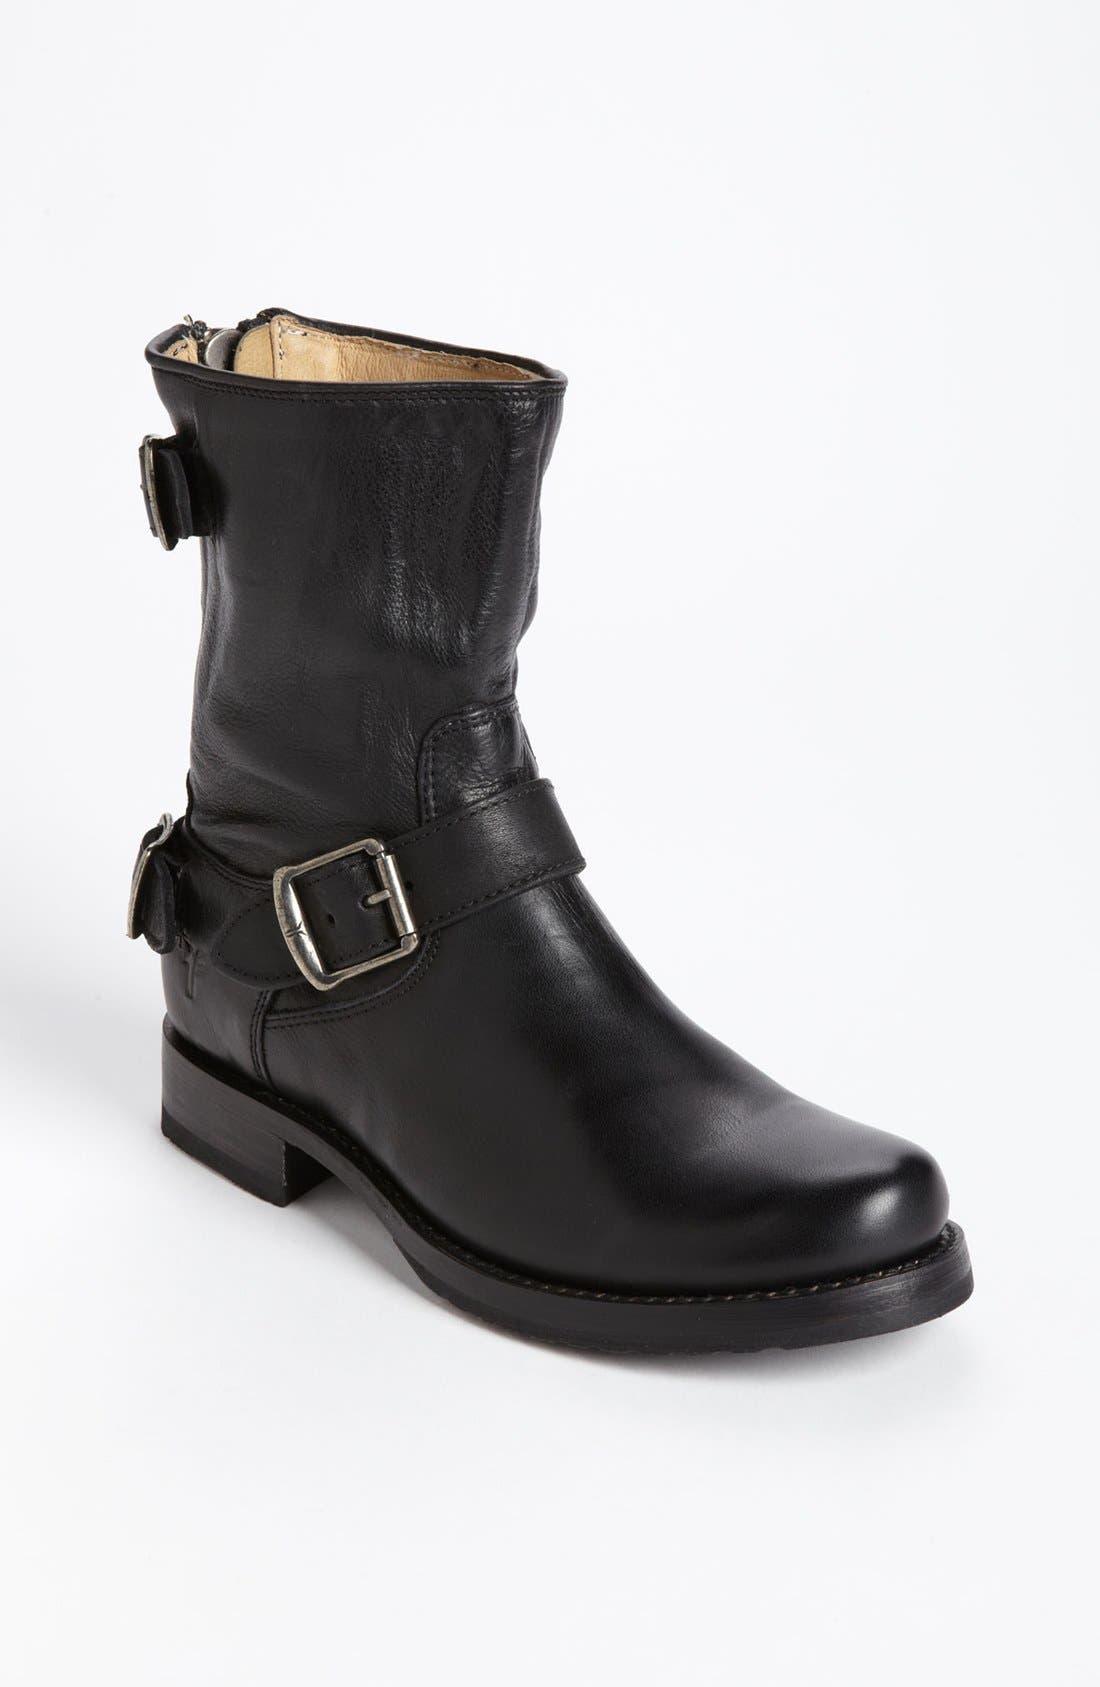 FRYE 'Veronica' Back Zip Short Boot, Main, color, 001